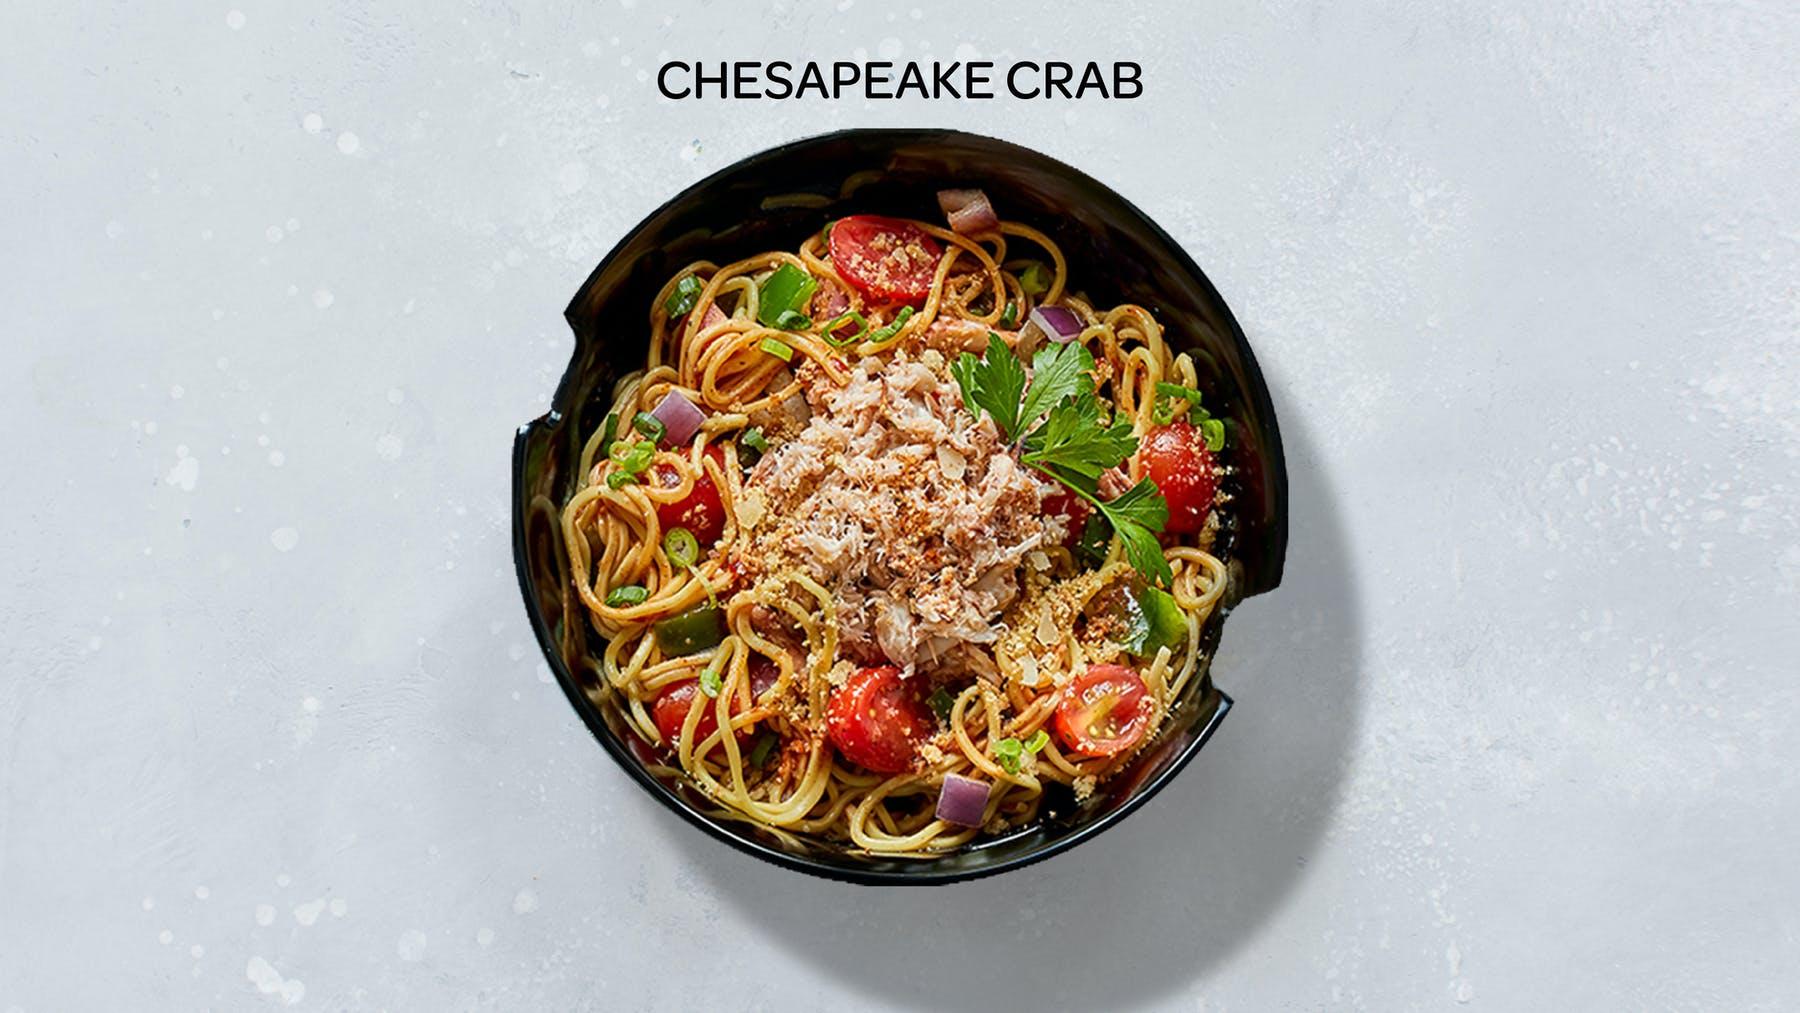 a bowl of Chesapeake crab stir-fry